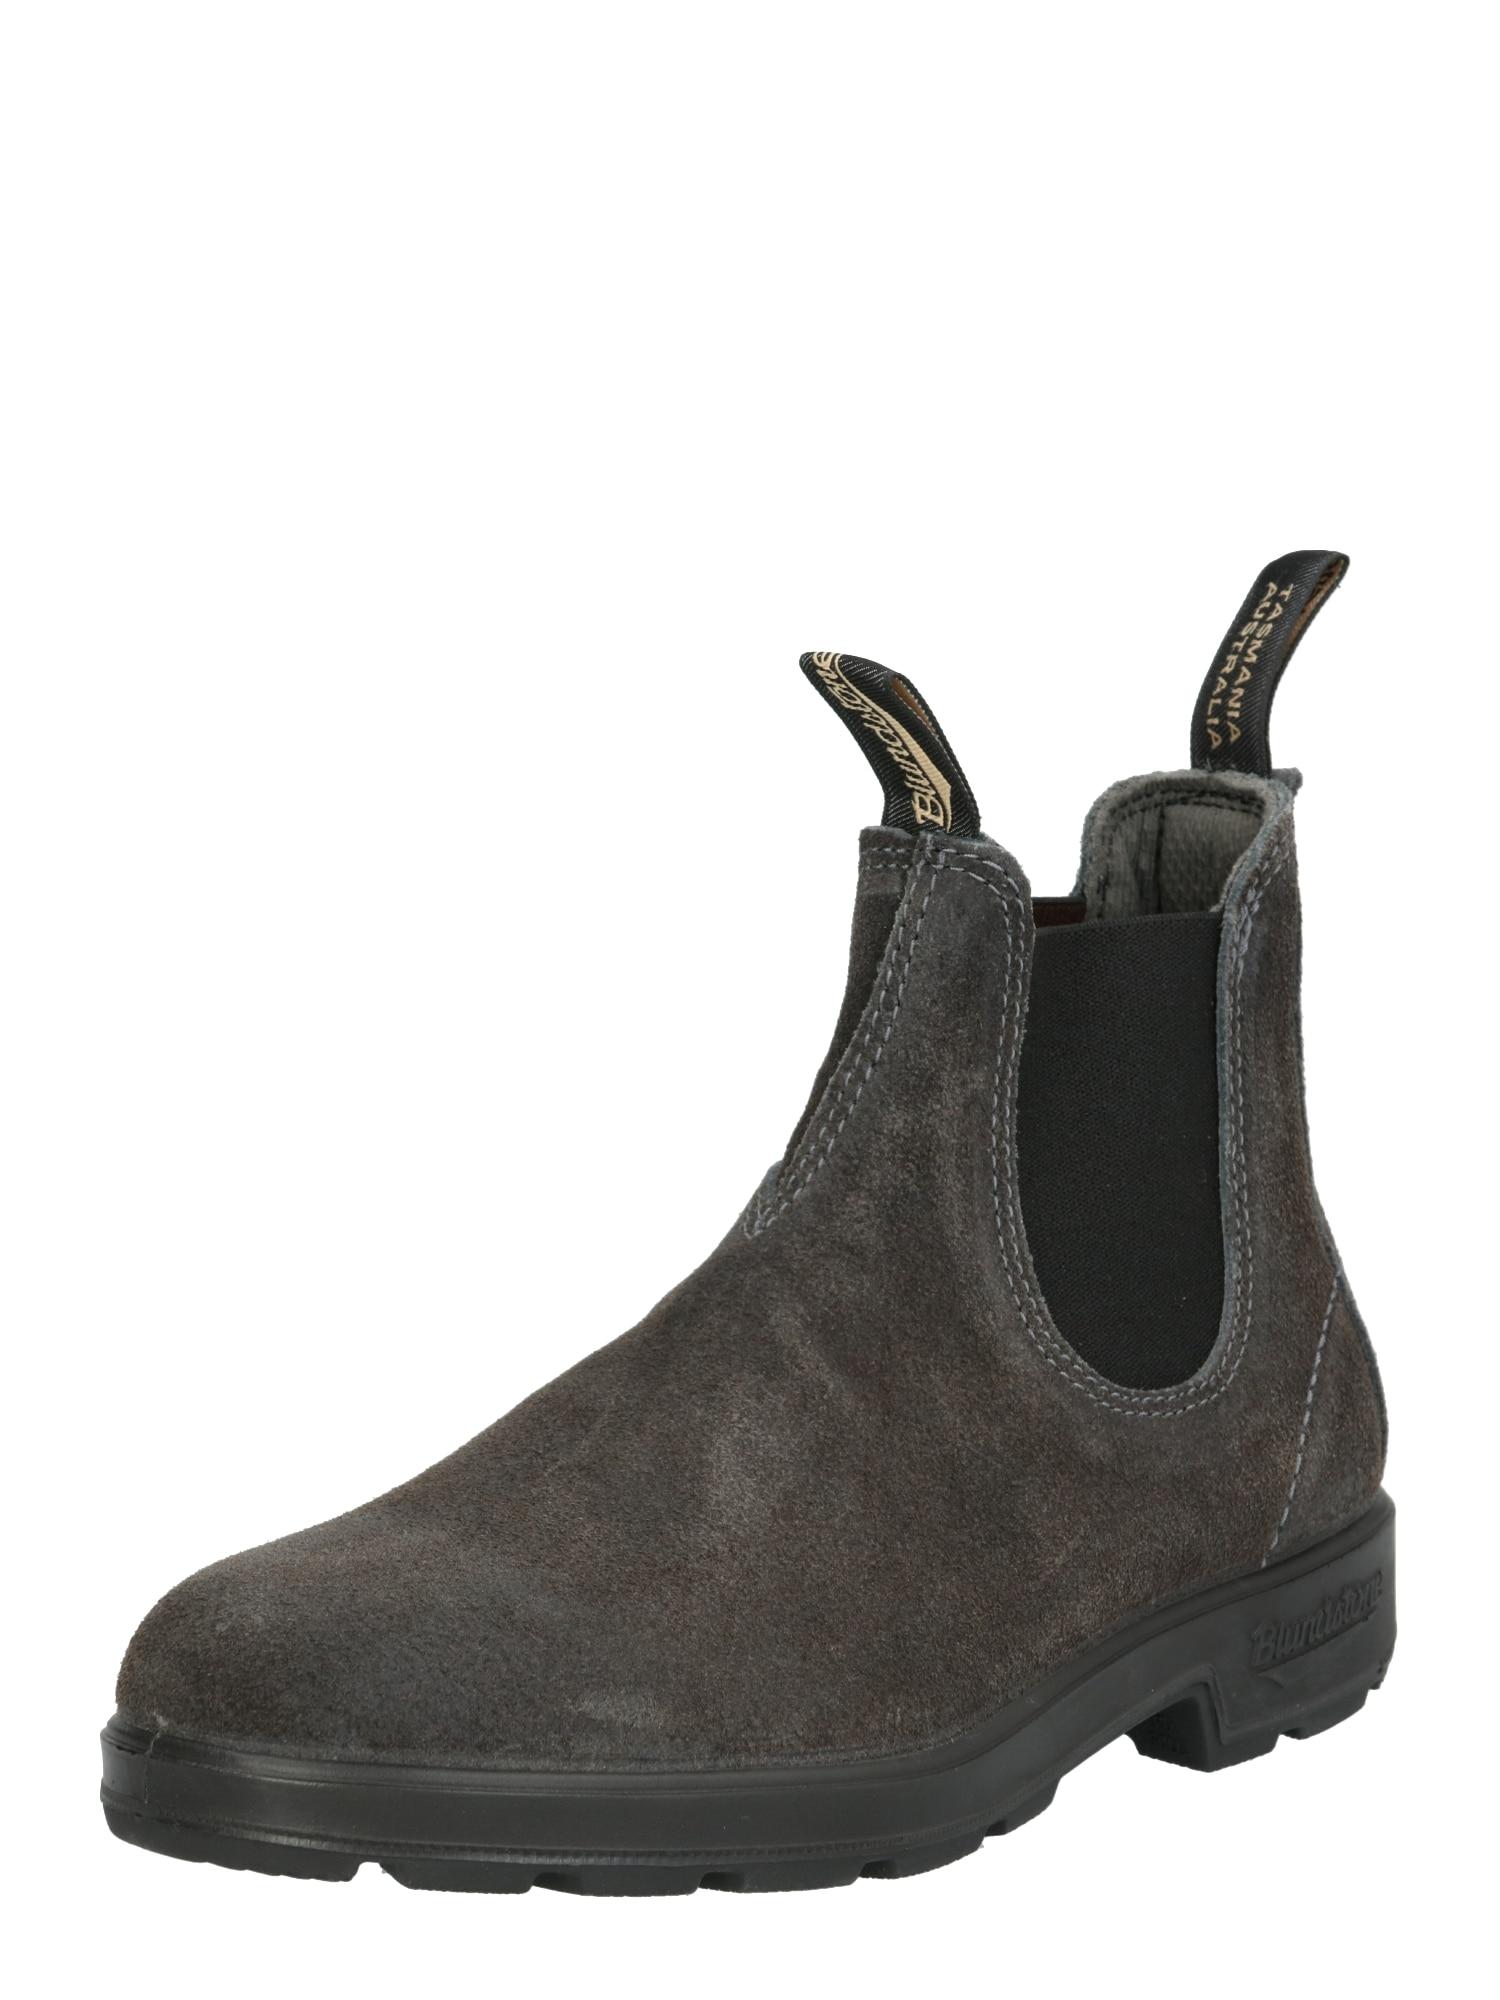 Blundstone Chelsea batai tamsiai pilka